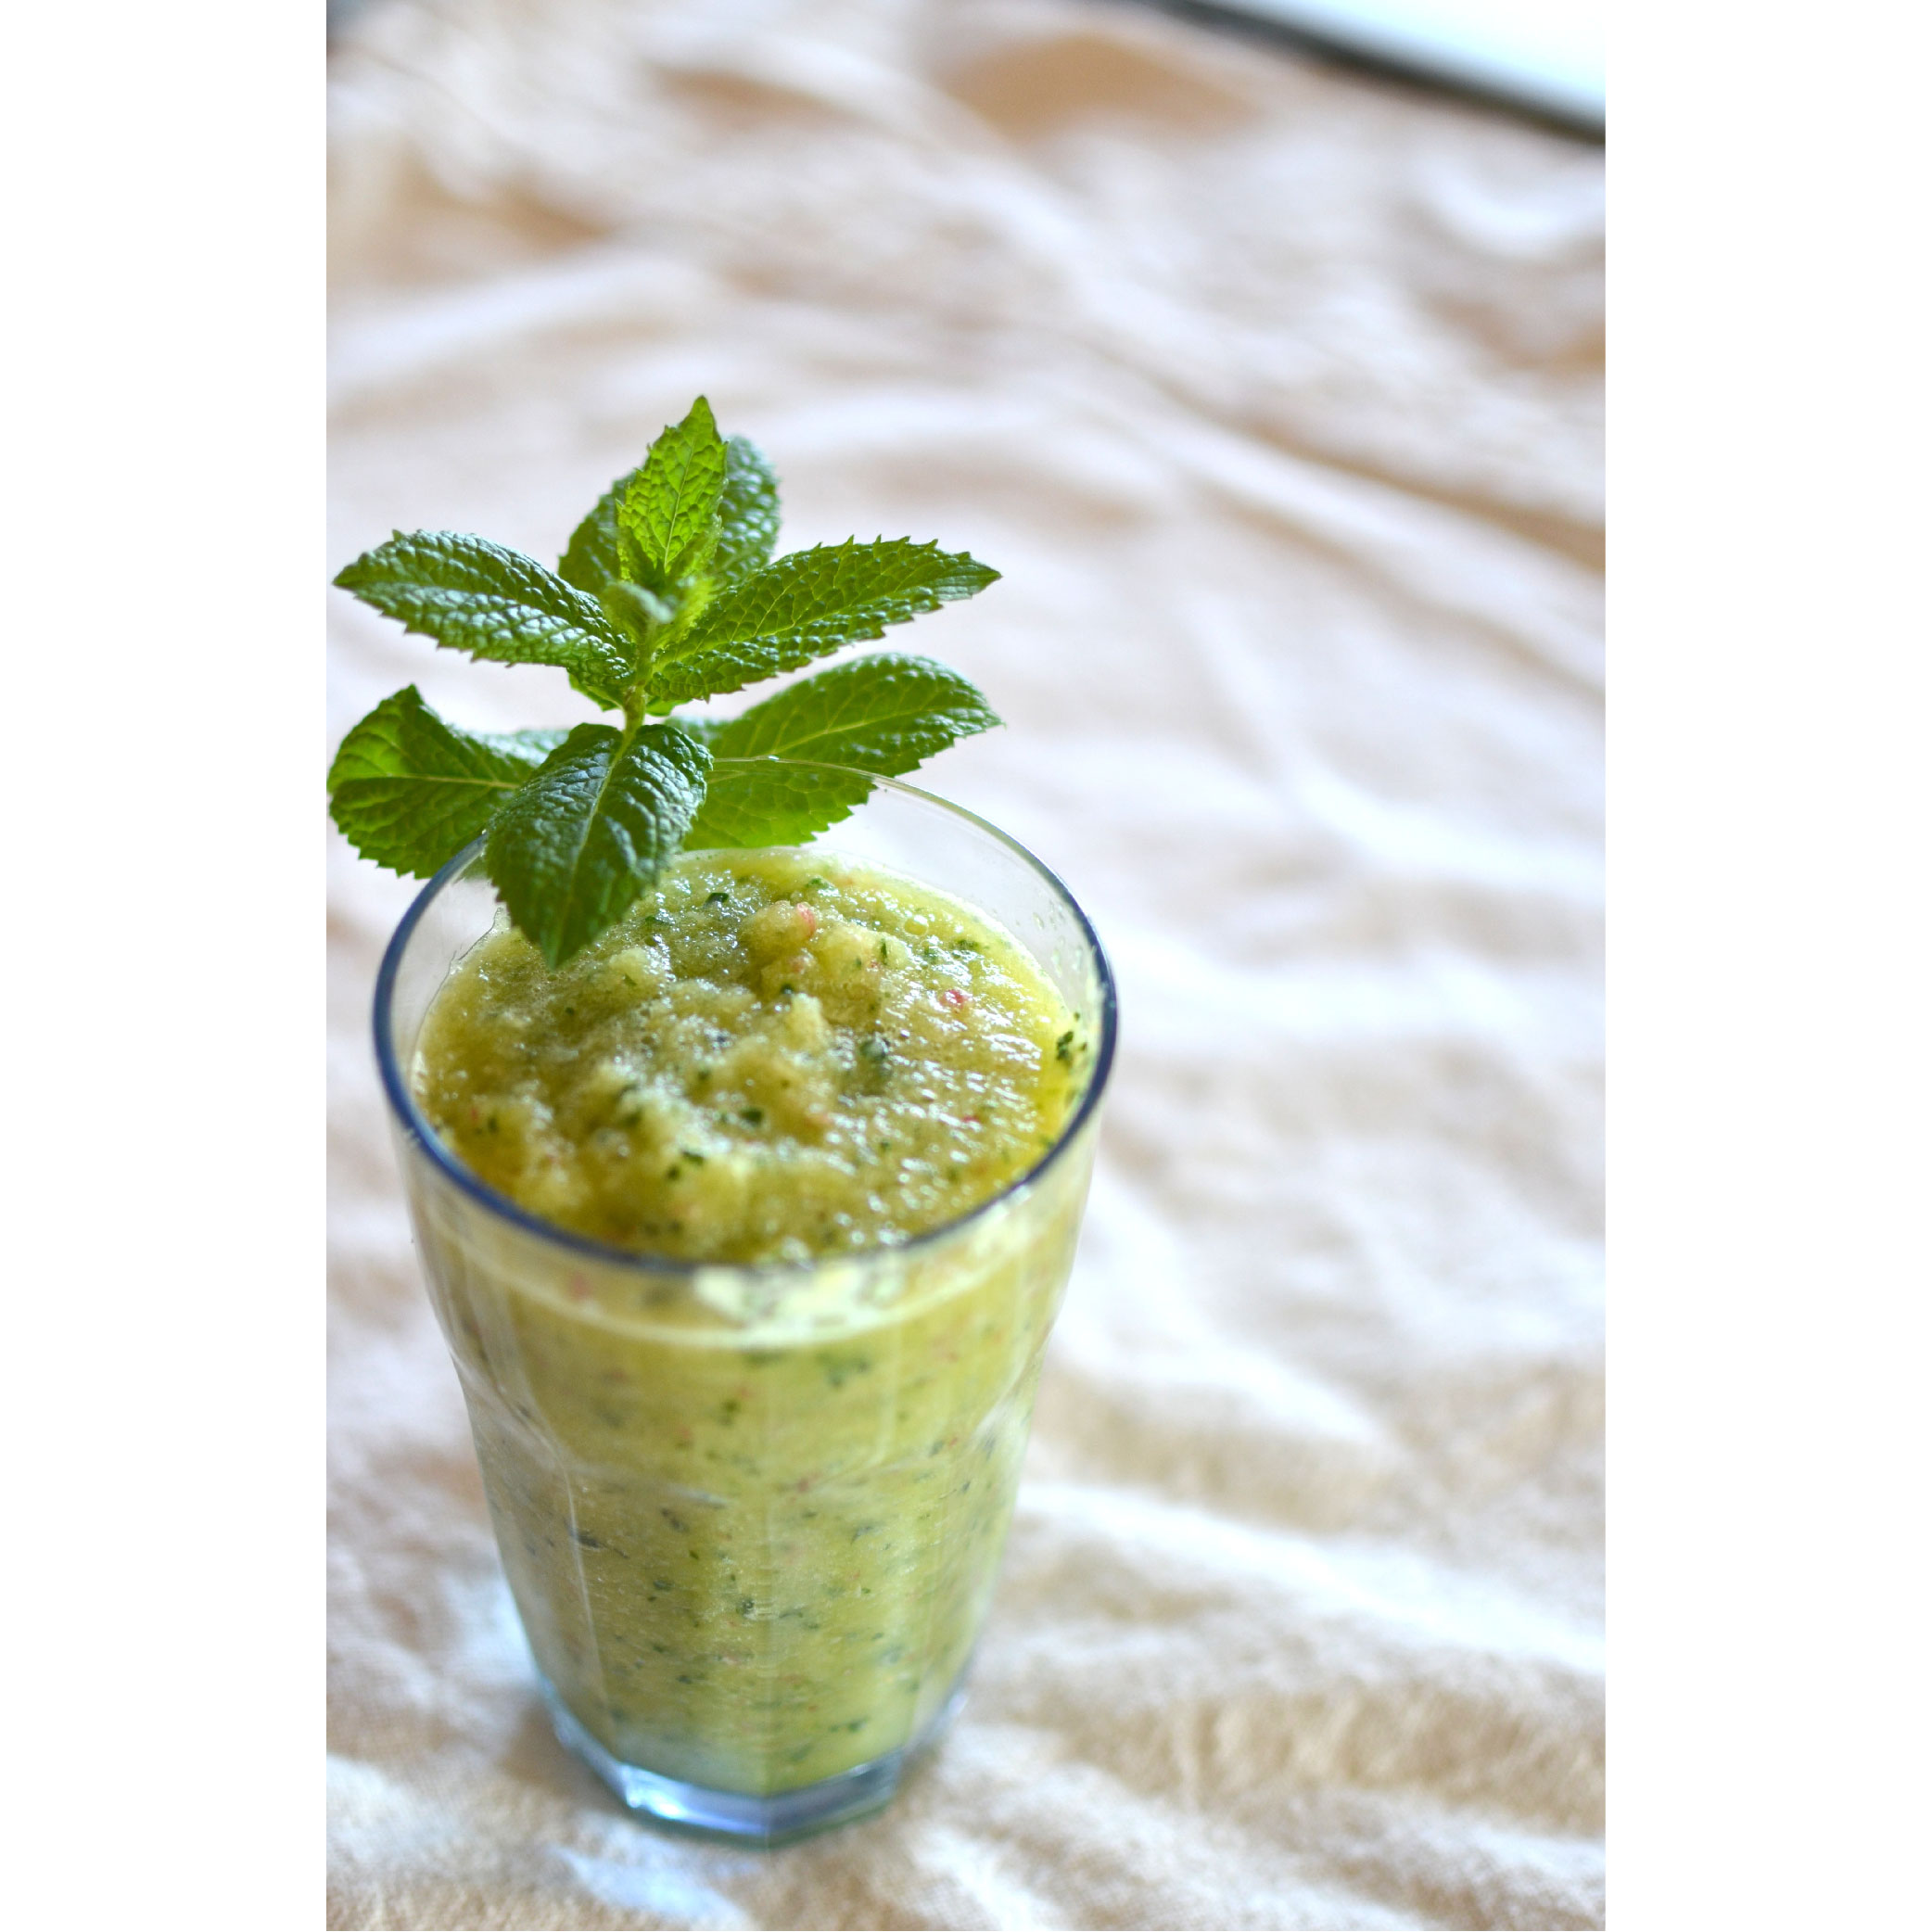 Cucumber, ginger, lemon, mint mix